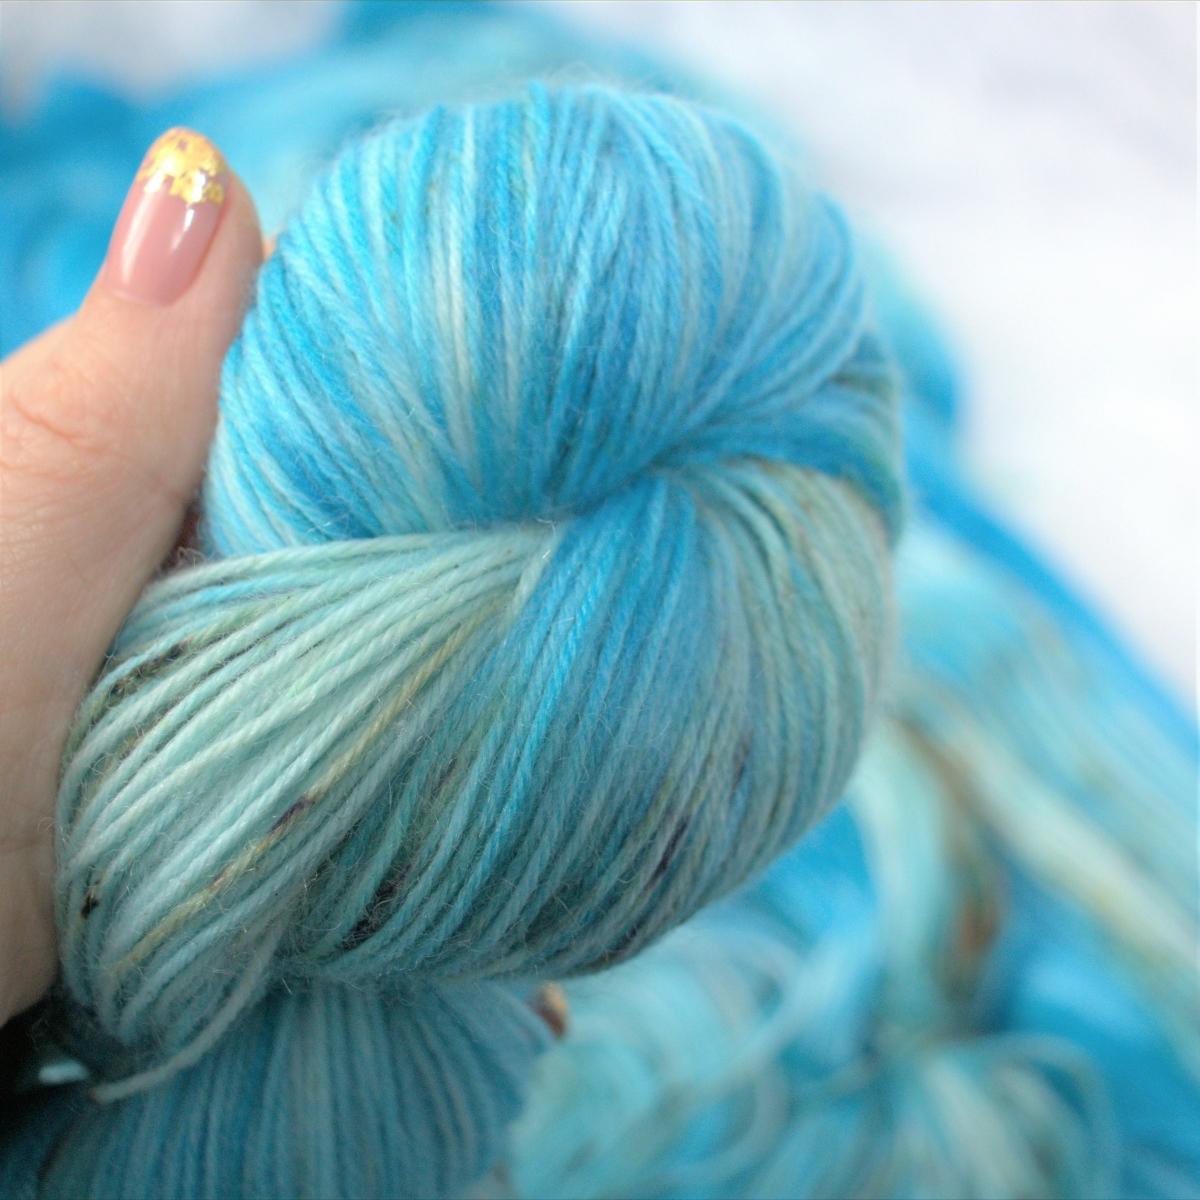 woodico.pro hand dyed yarn 050 5 1200x1200 - Hand dyed yarn / 050